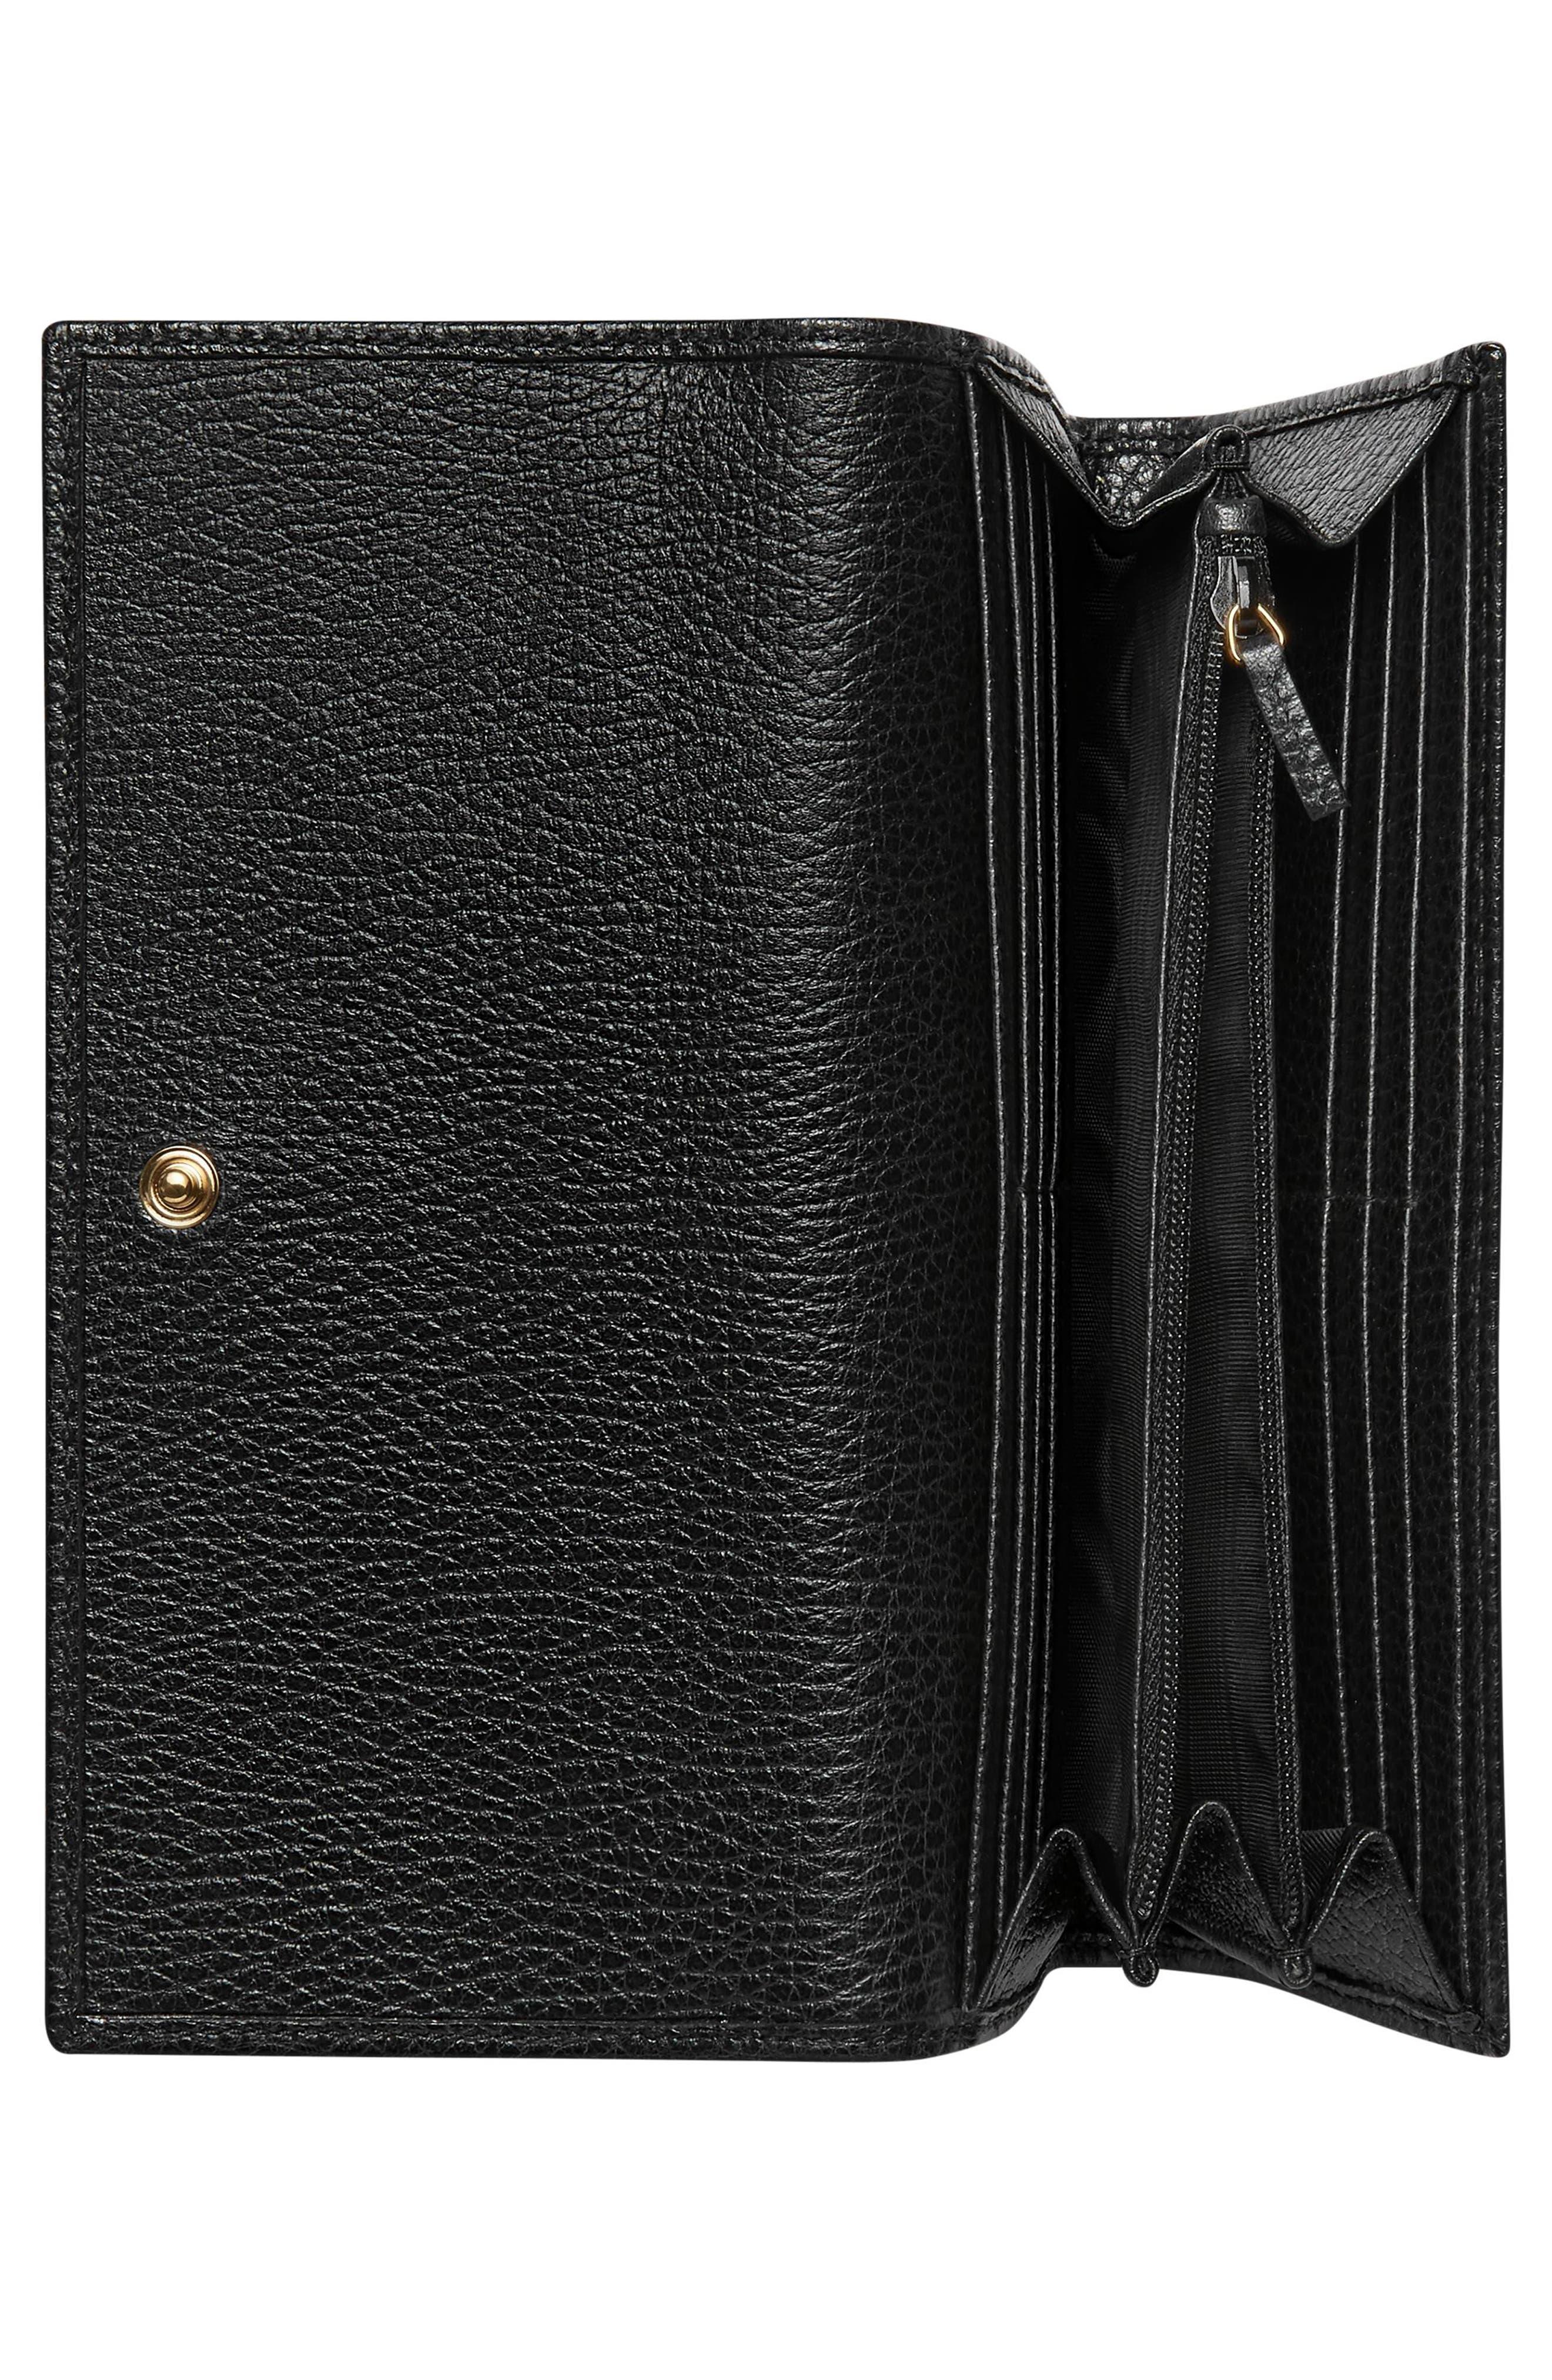 Petite Marmont Leather Continental Wallet,                             Alternate thumbnail 2, color,                             NERO/ NERO